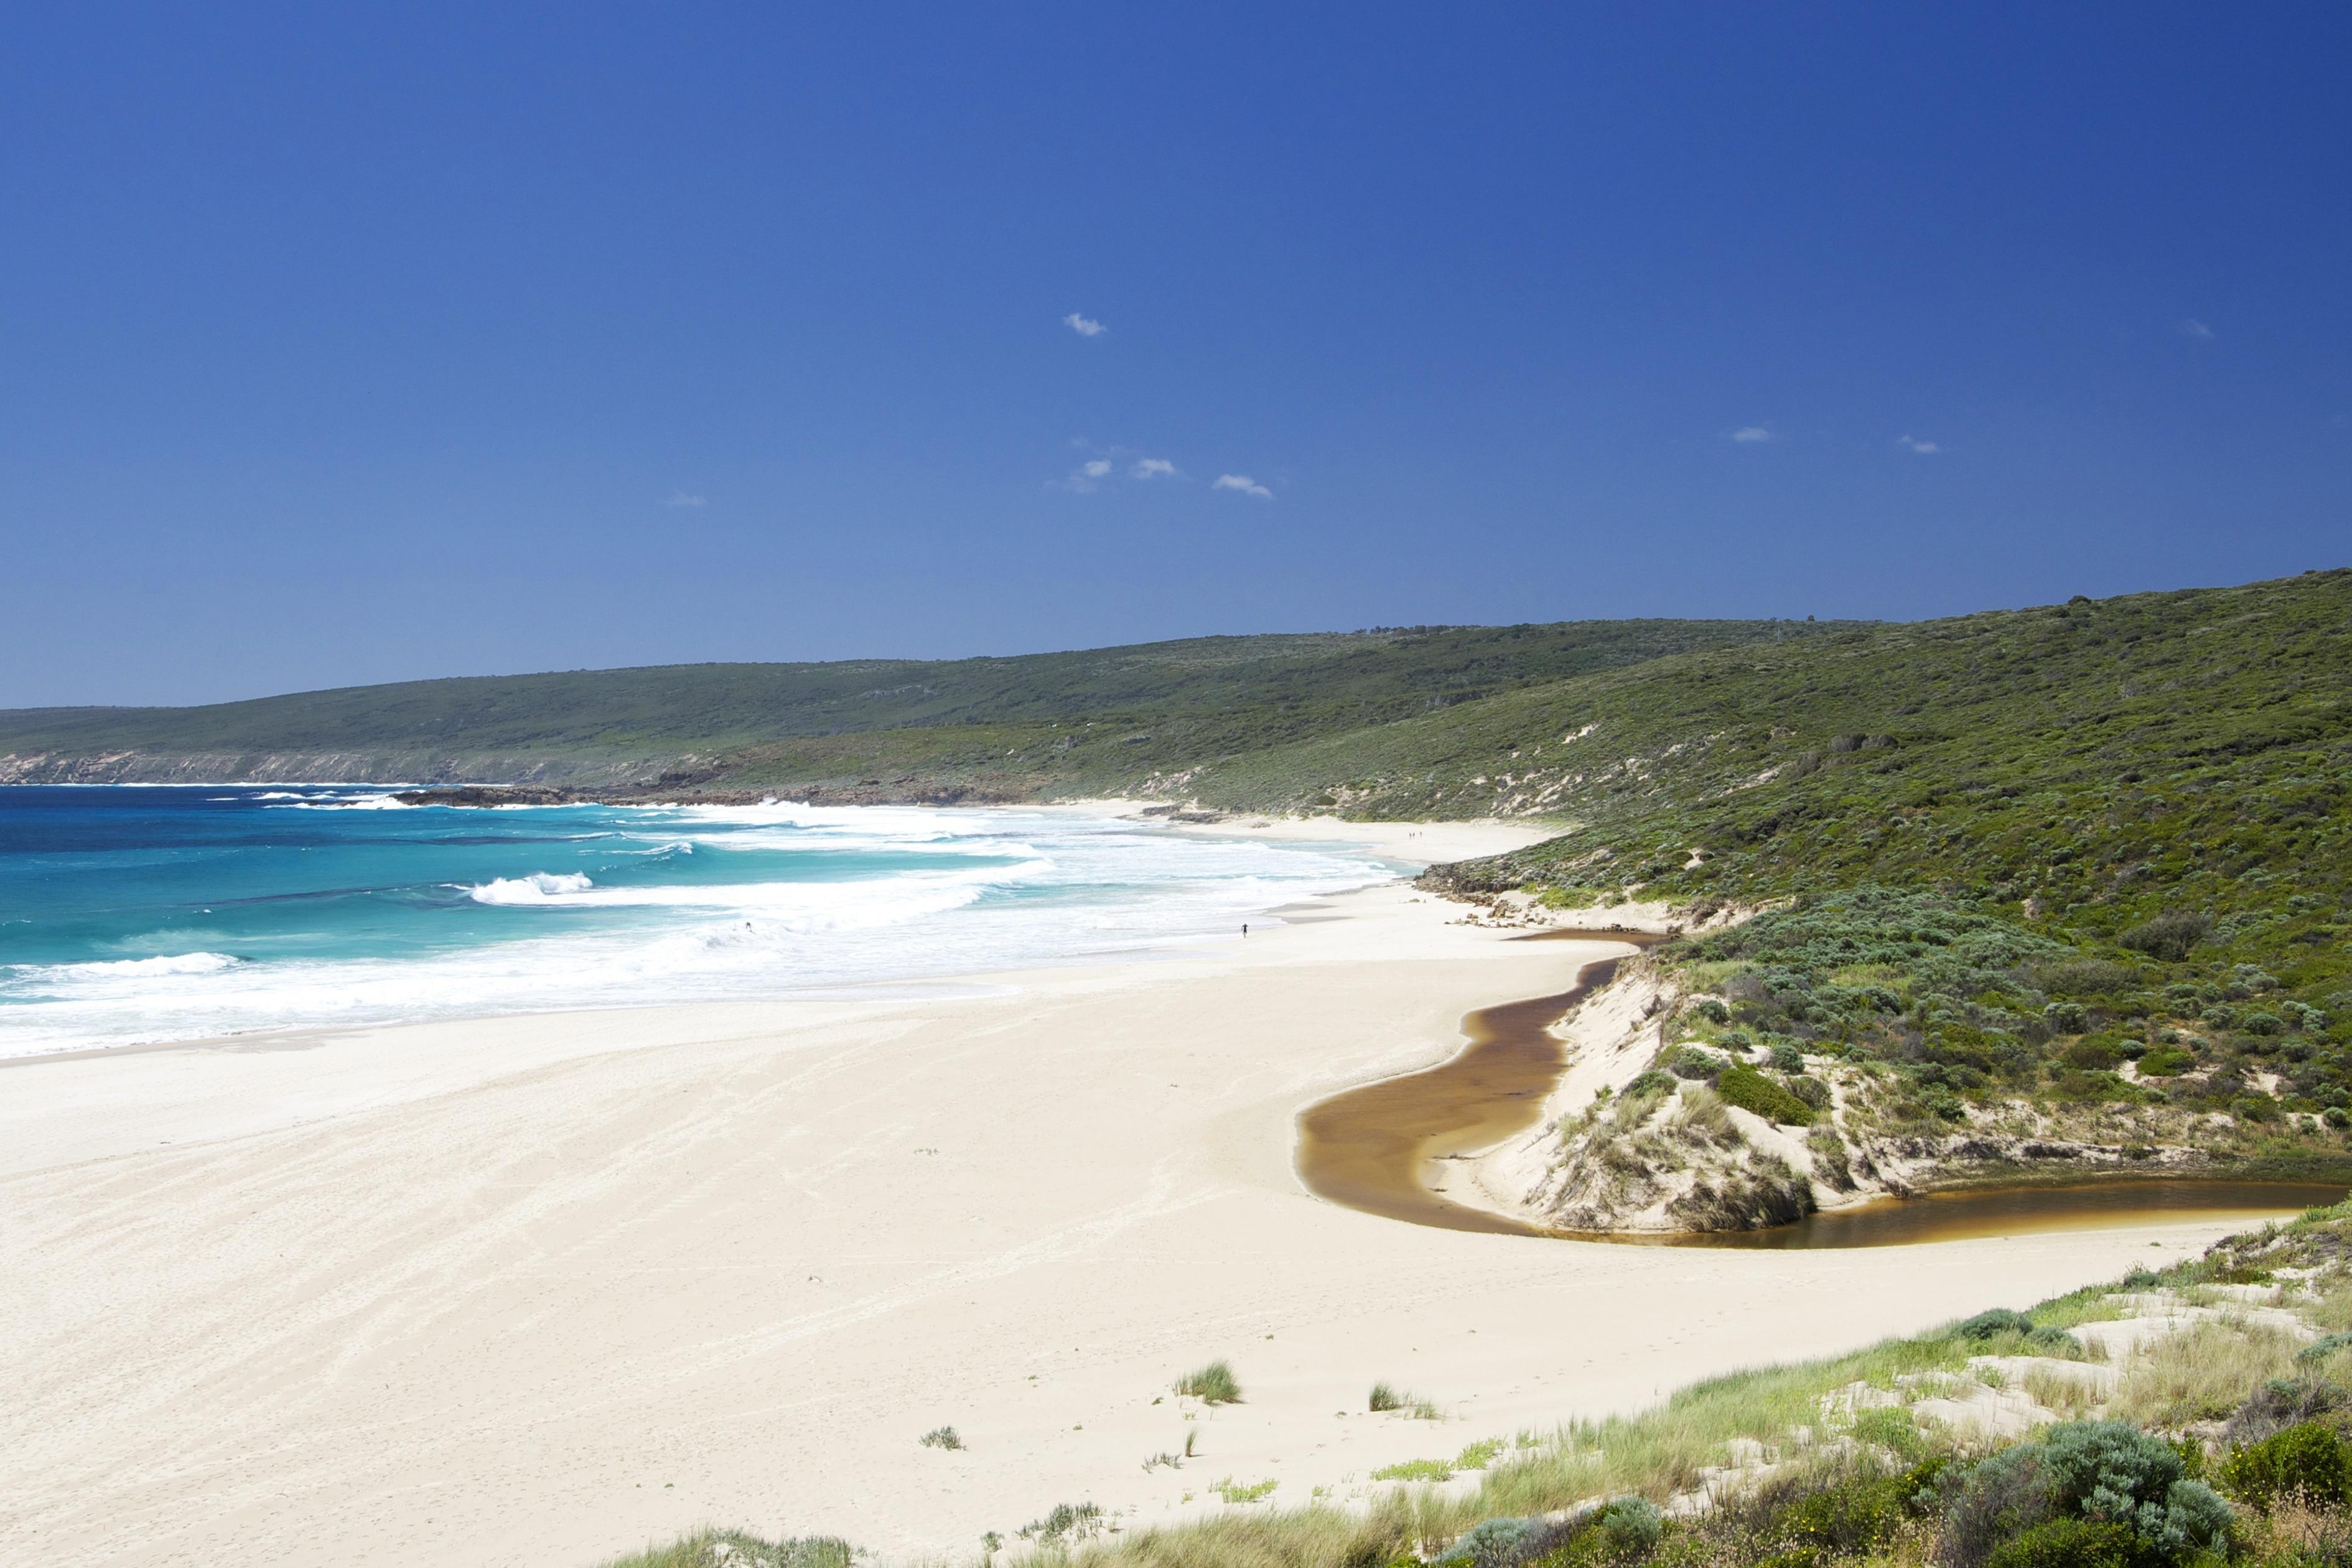 Yallingup Beach, Western Australia, Australia